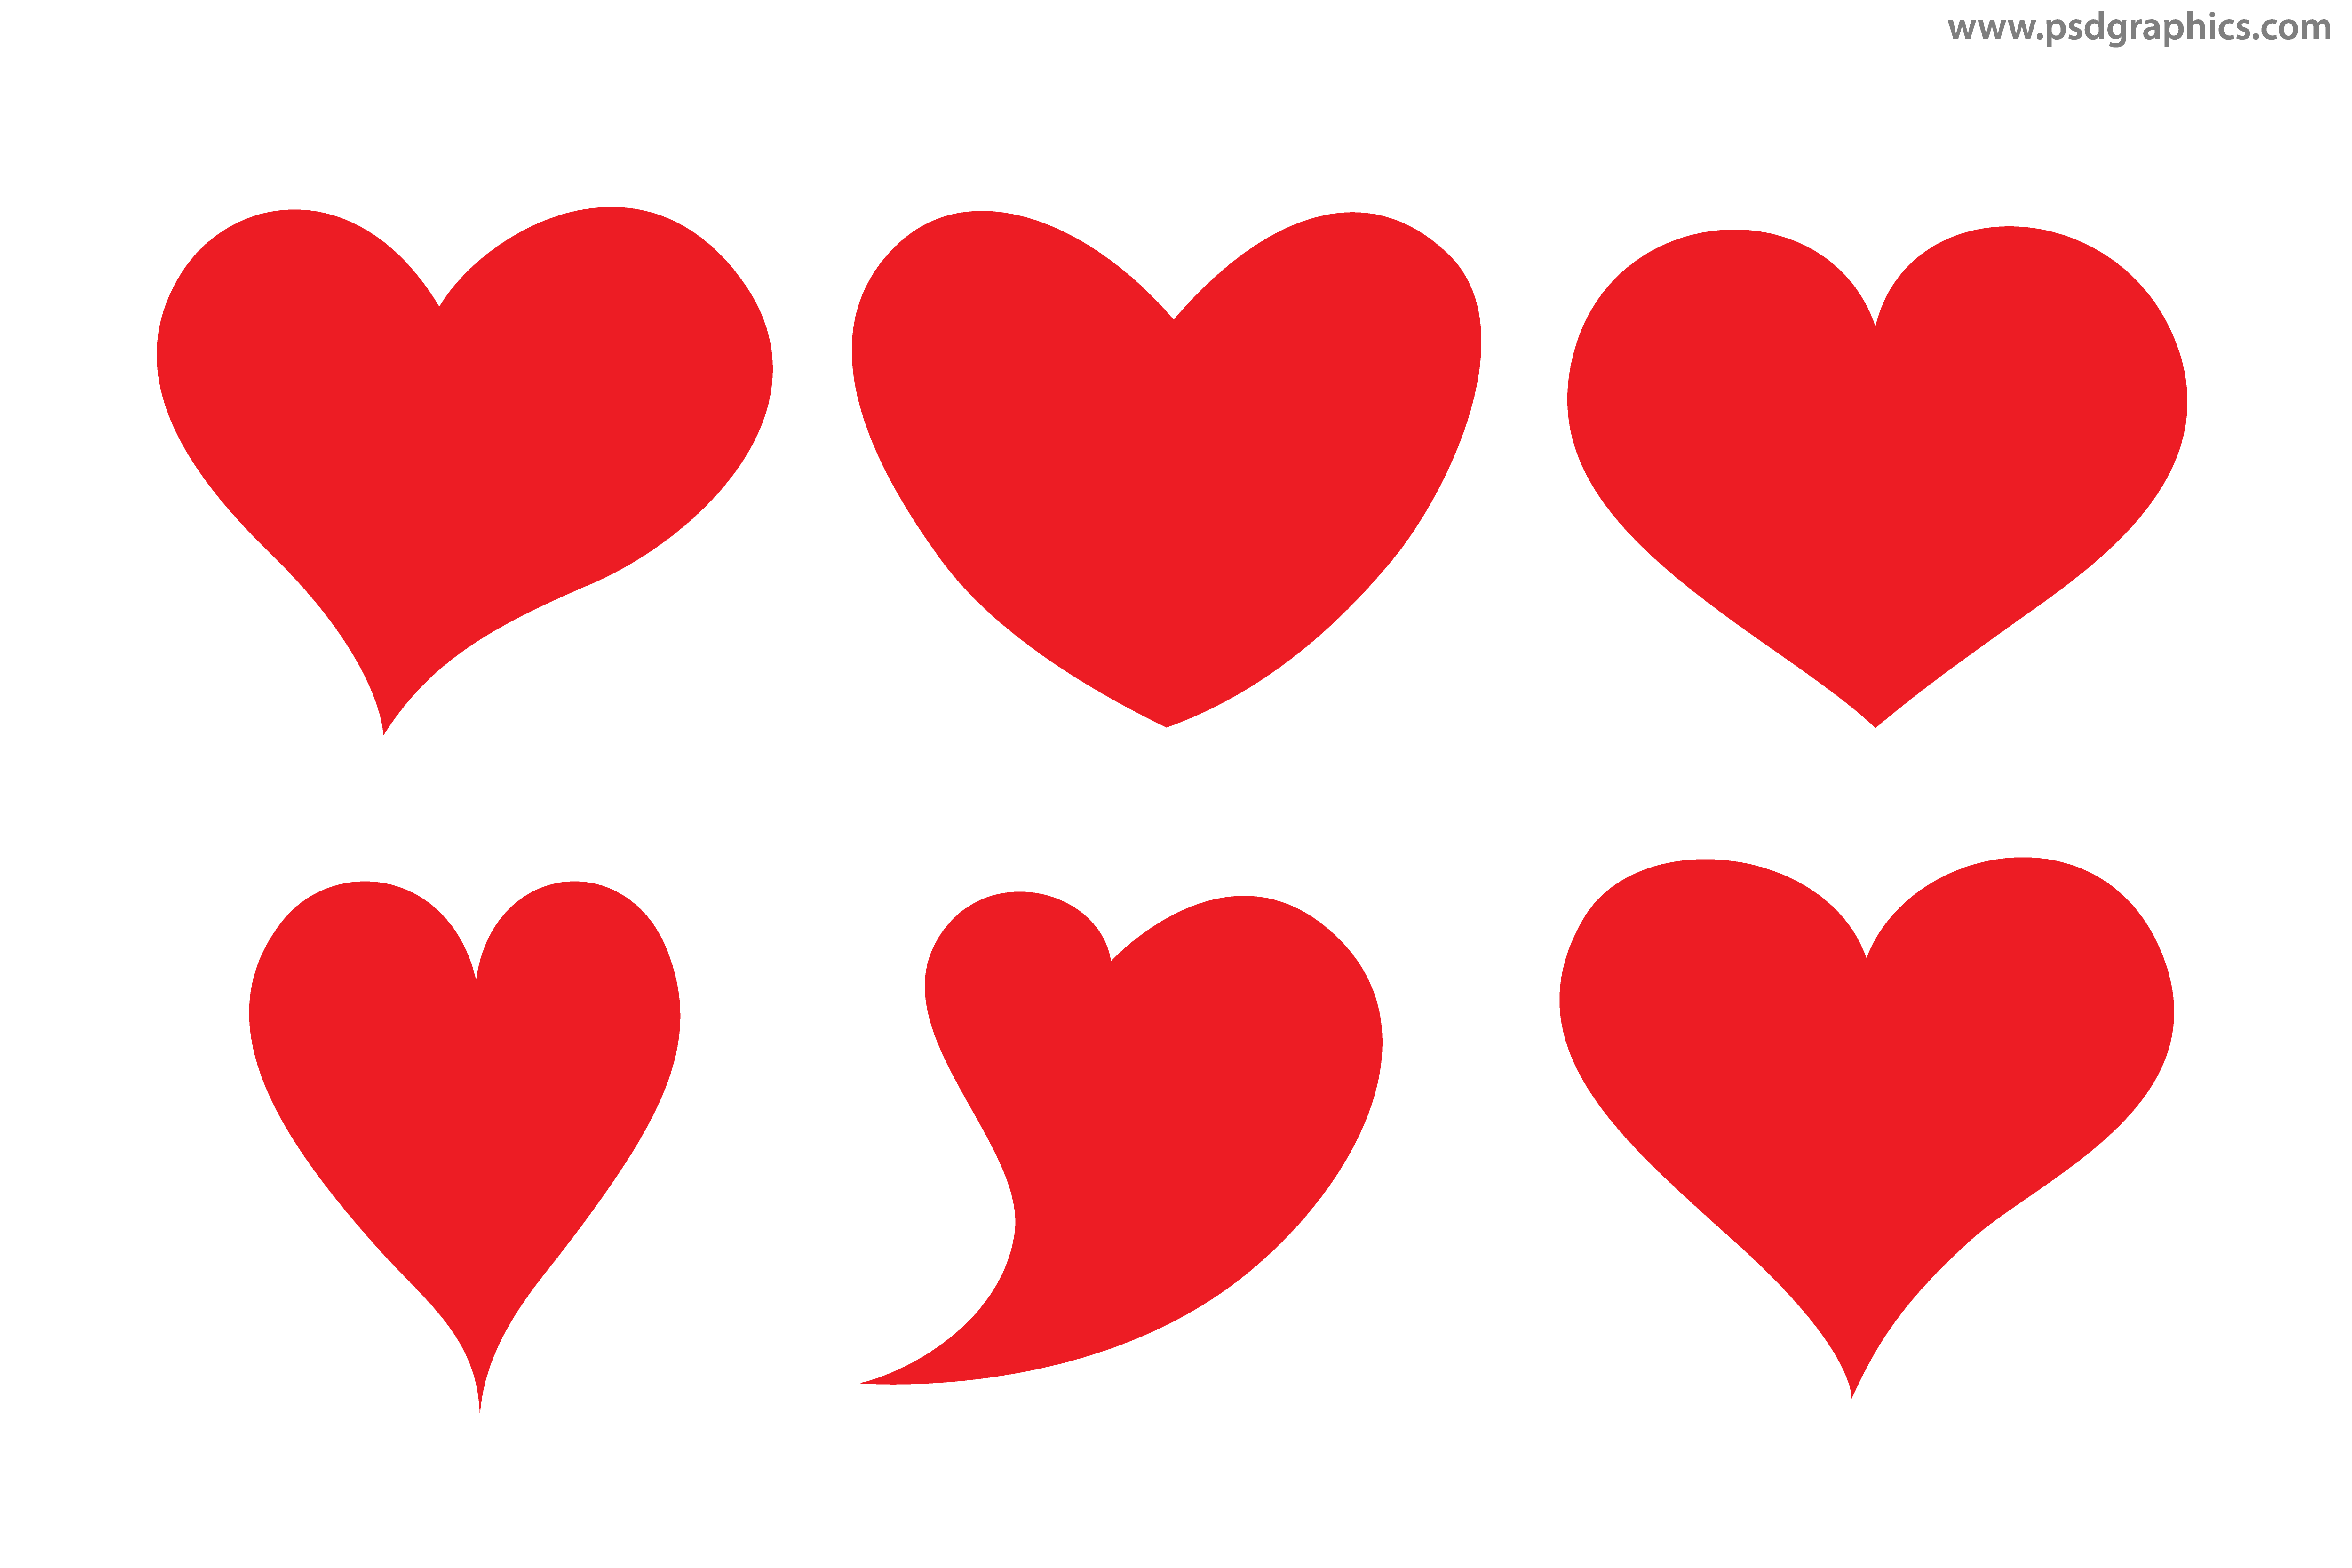 vector hearts shapes psdgraphics rh psdgraphics com vector heartworm vector heart art